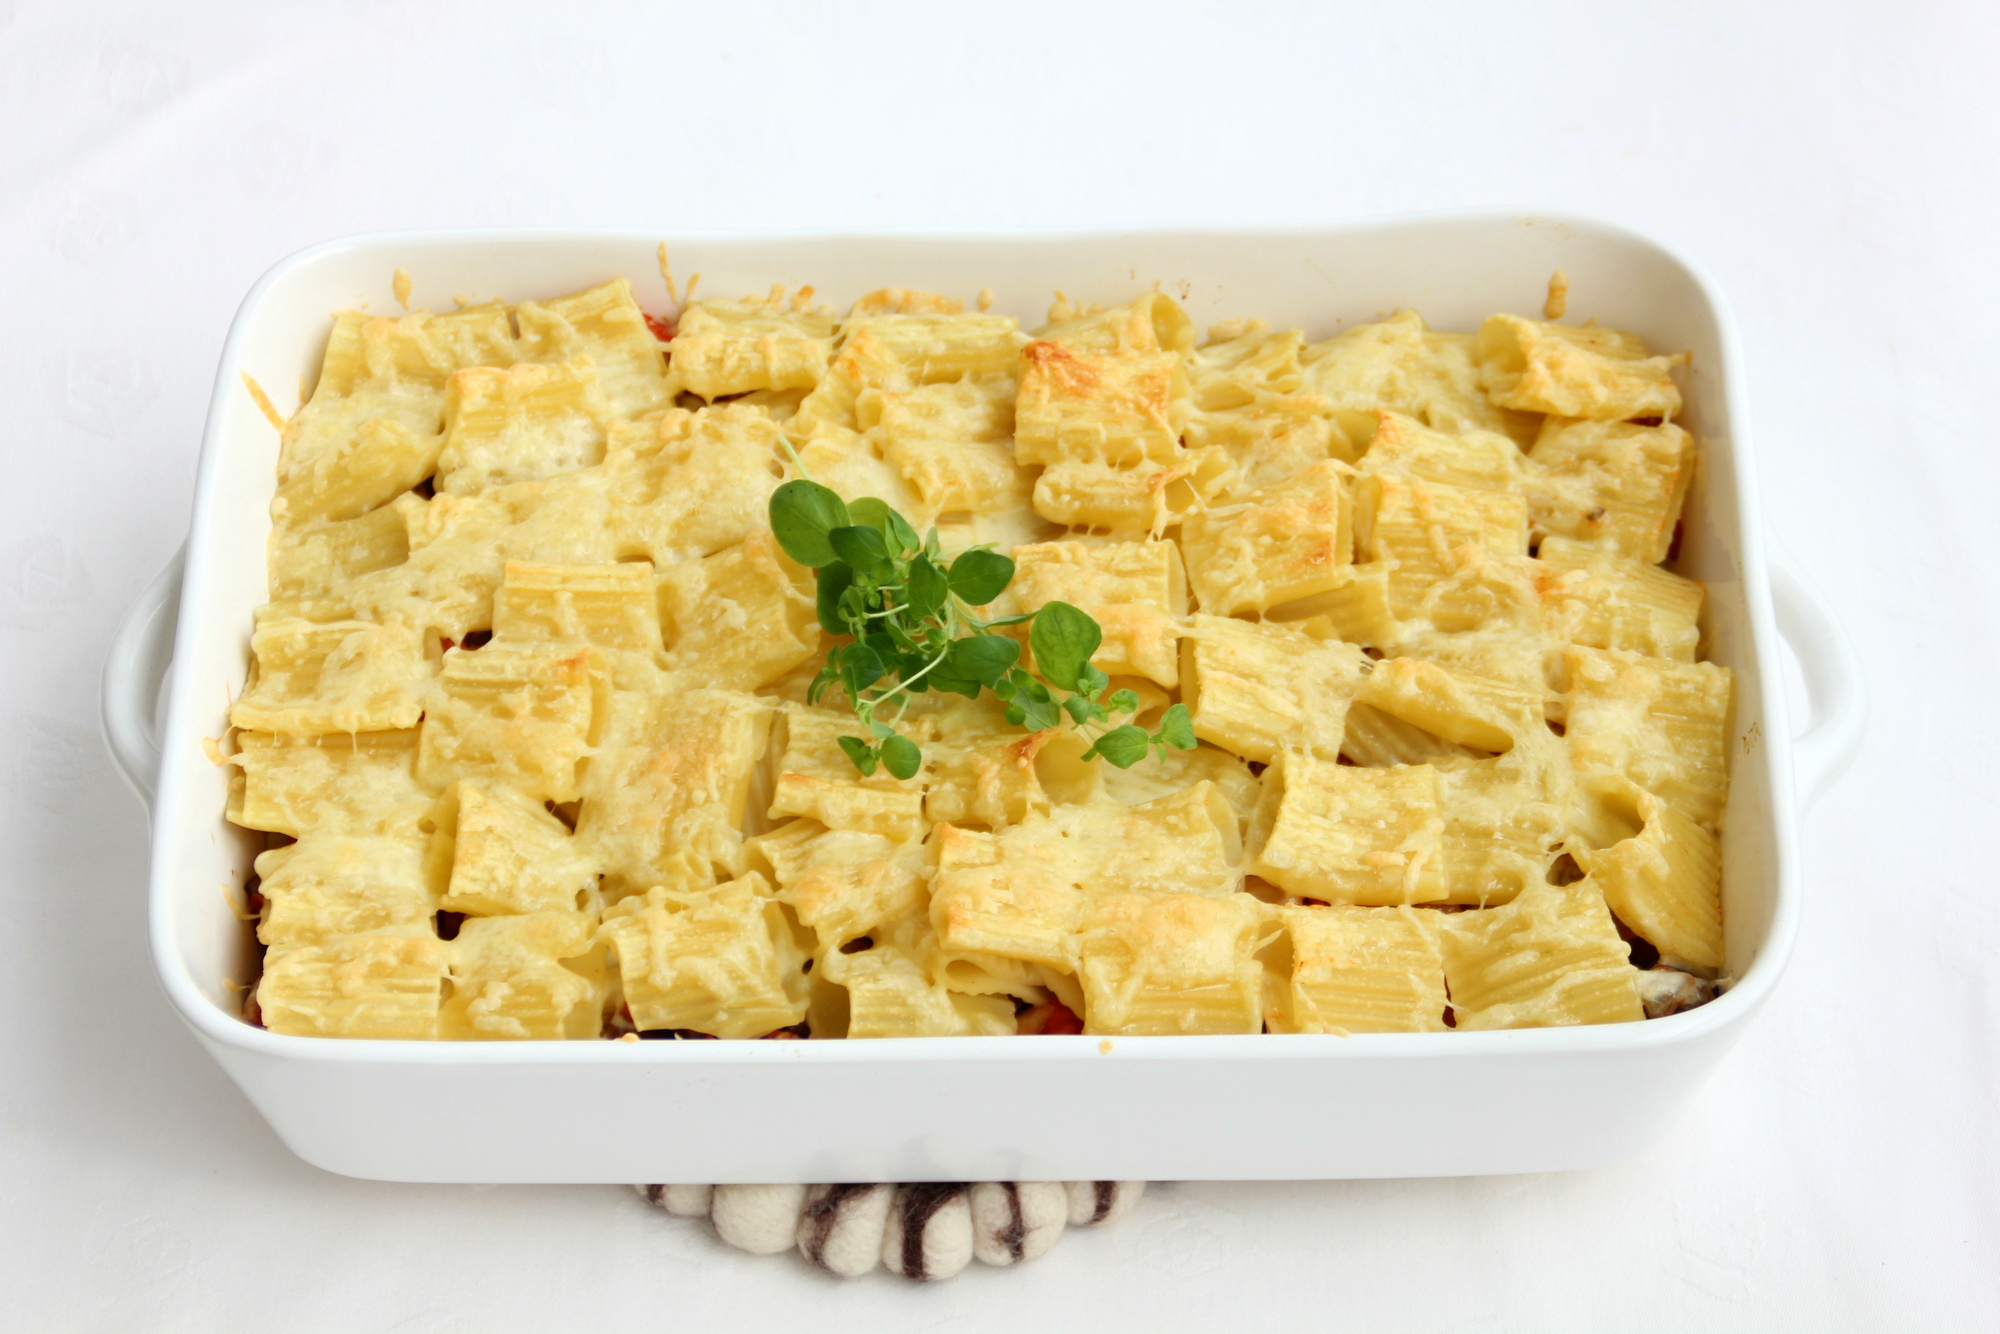 Rigatoni-munakoiso uunivuoka